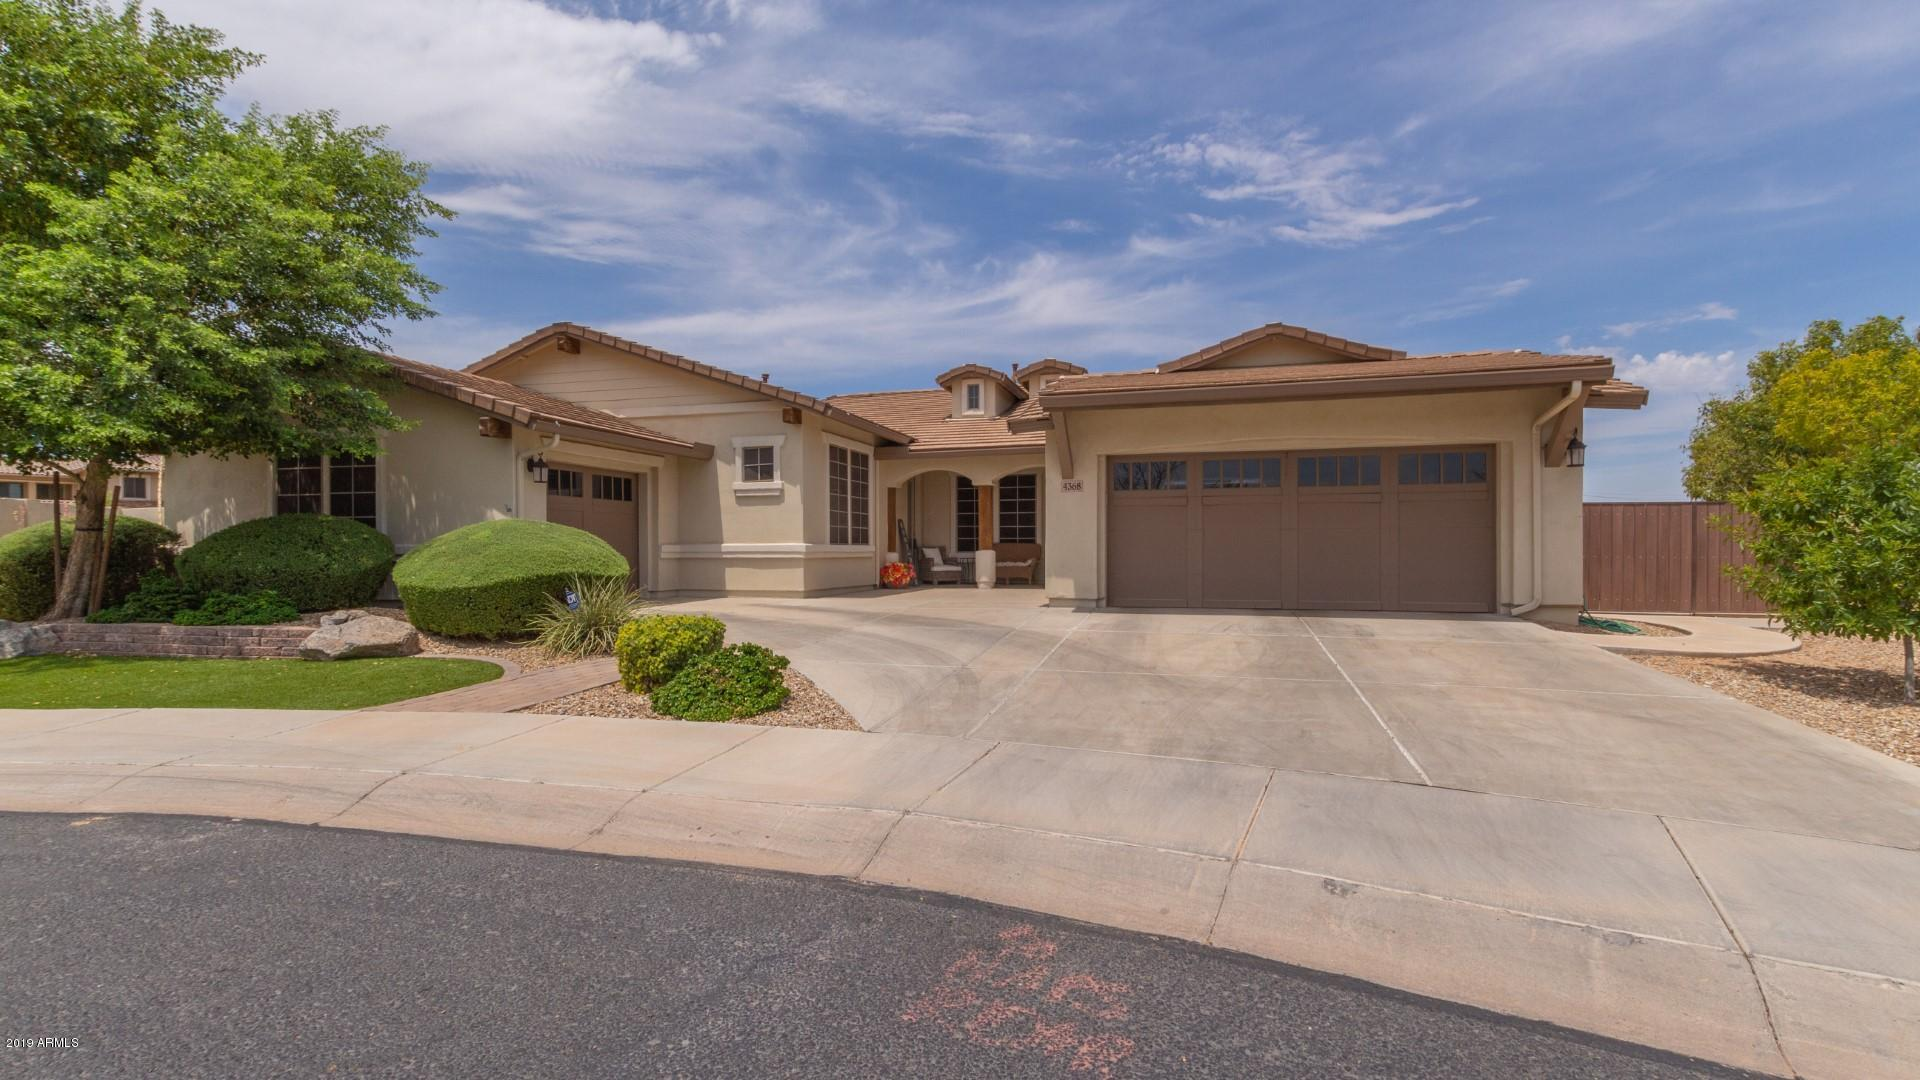 Photo of 4368 N 158TH Drive, Goodyear, AZ 85395